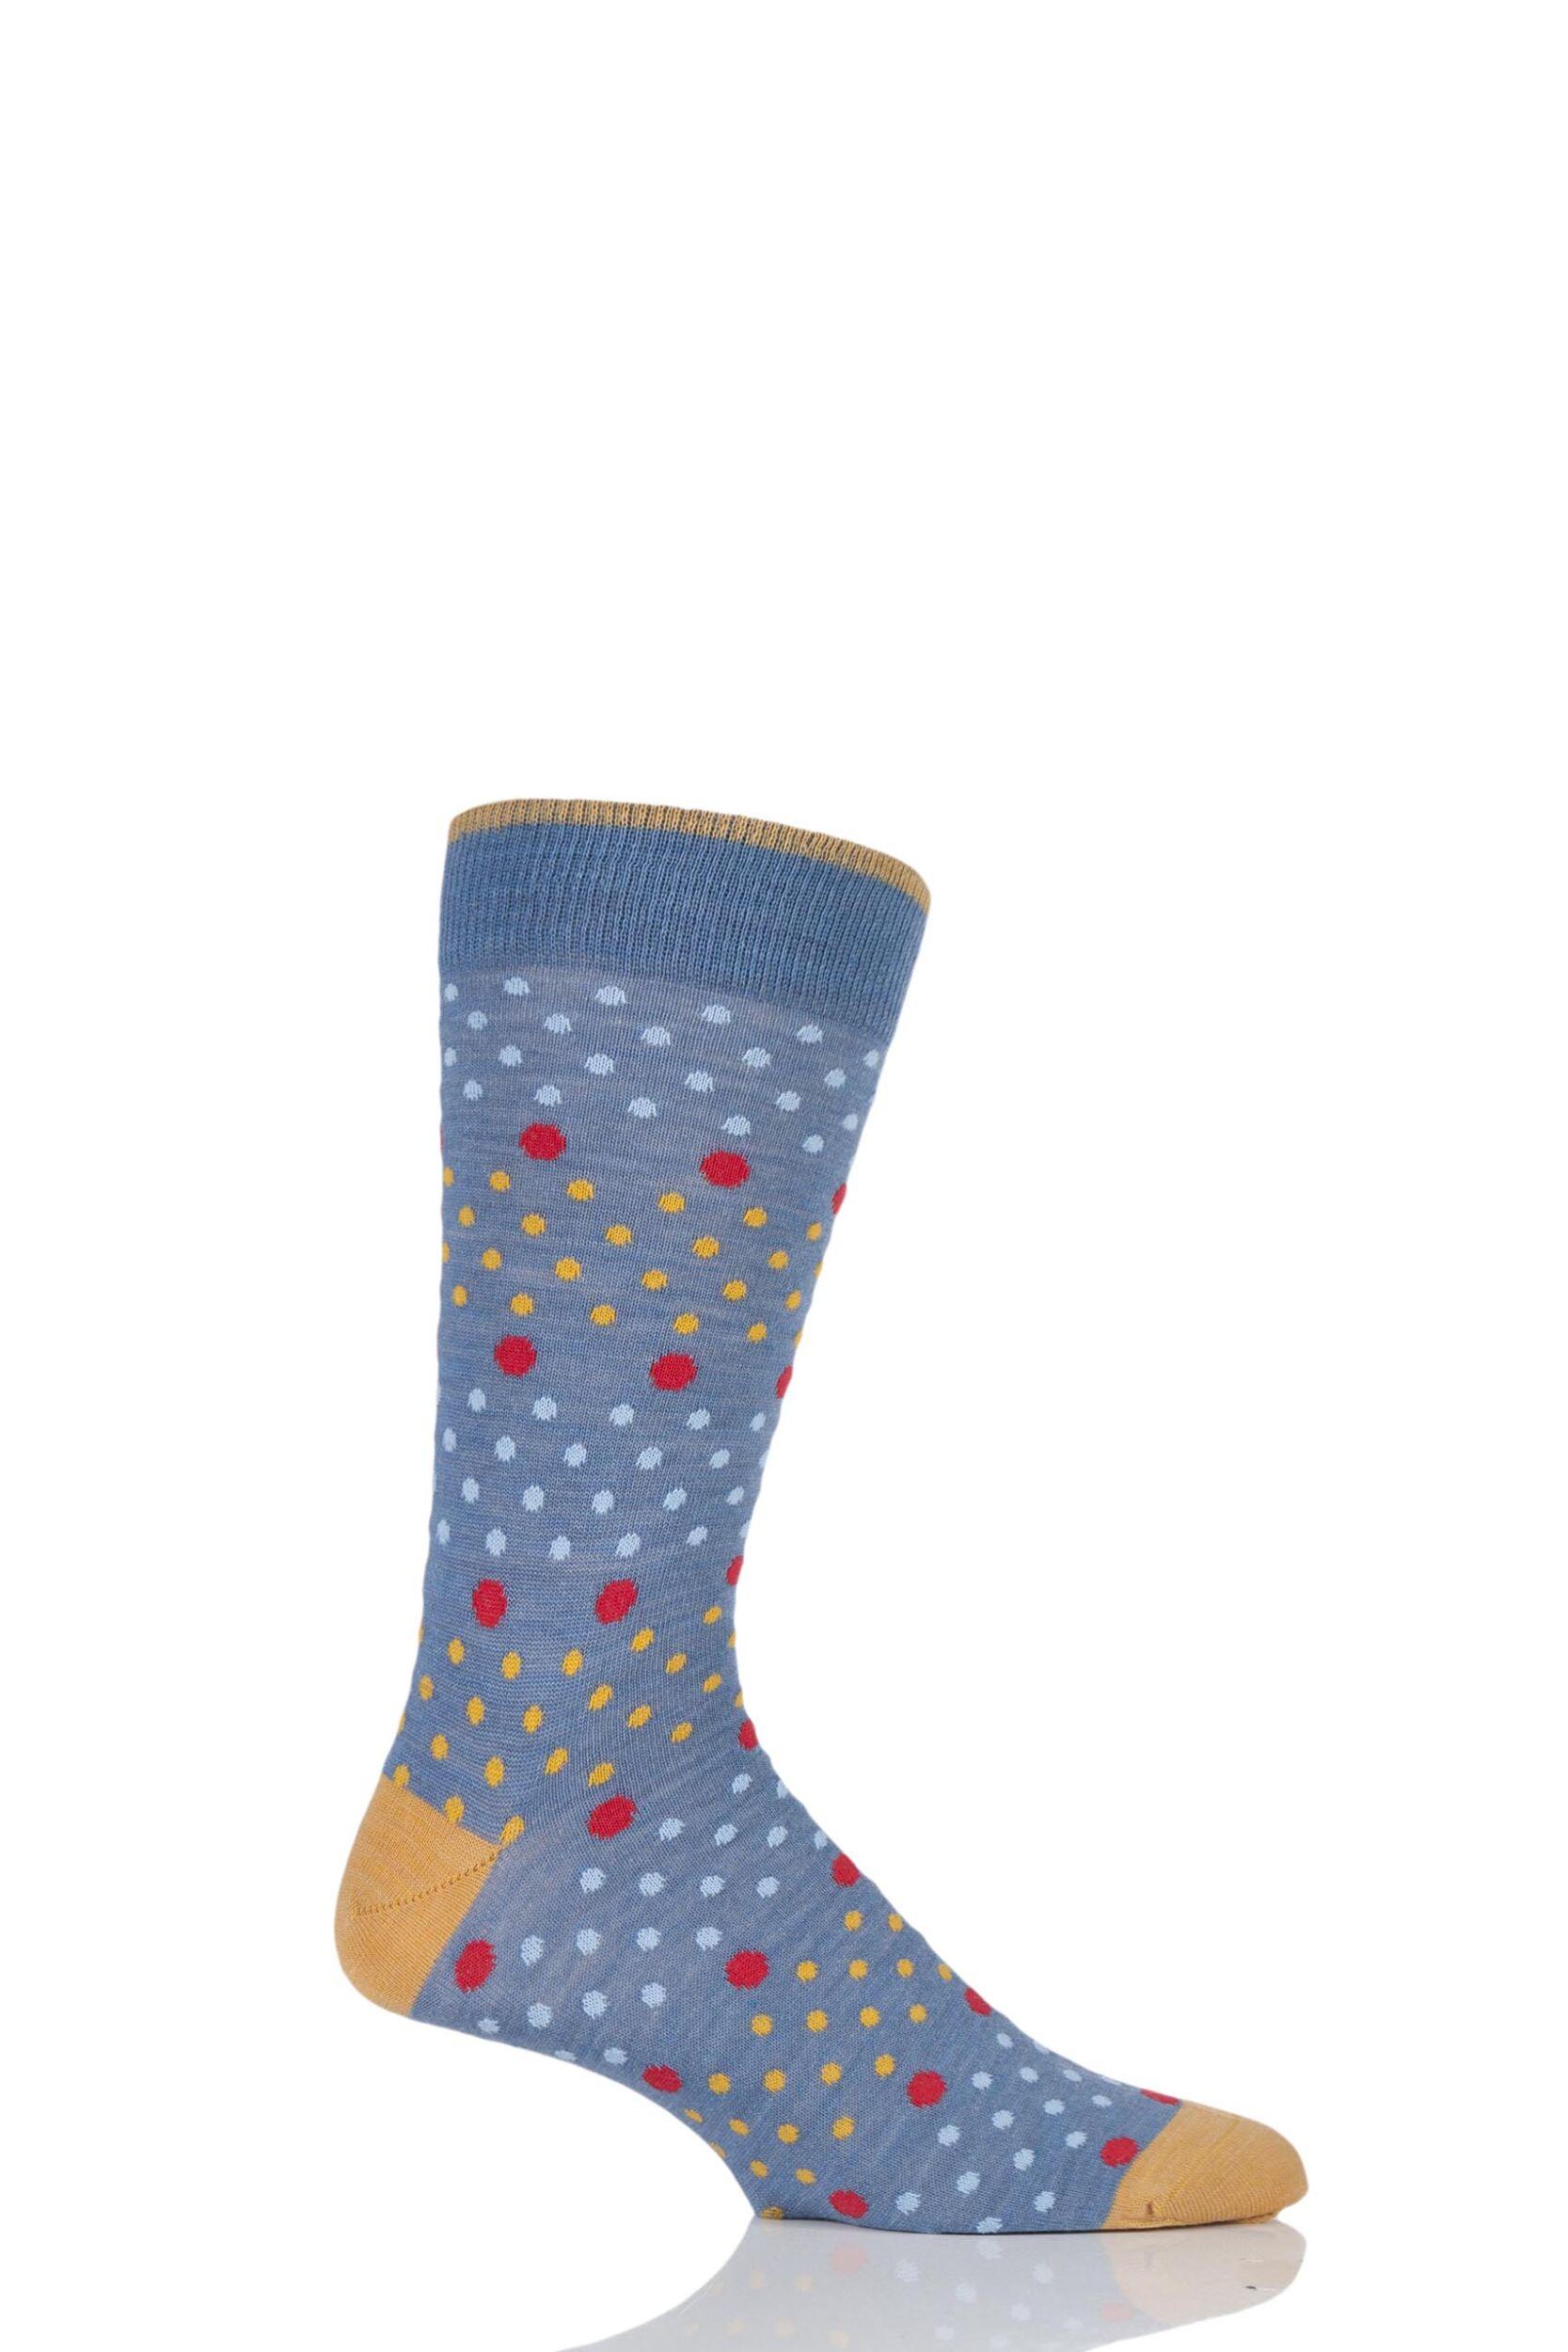 Mens 1 Pair Viyella Multi Spot and Dot Wool Cotton Socks 6-11 Mens ...